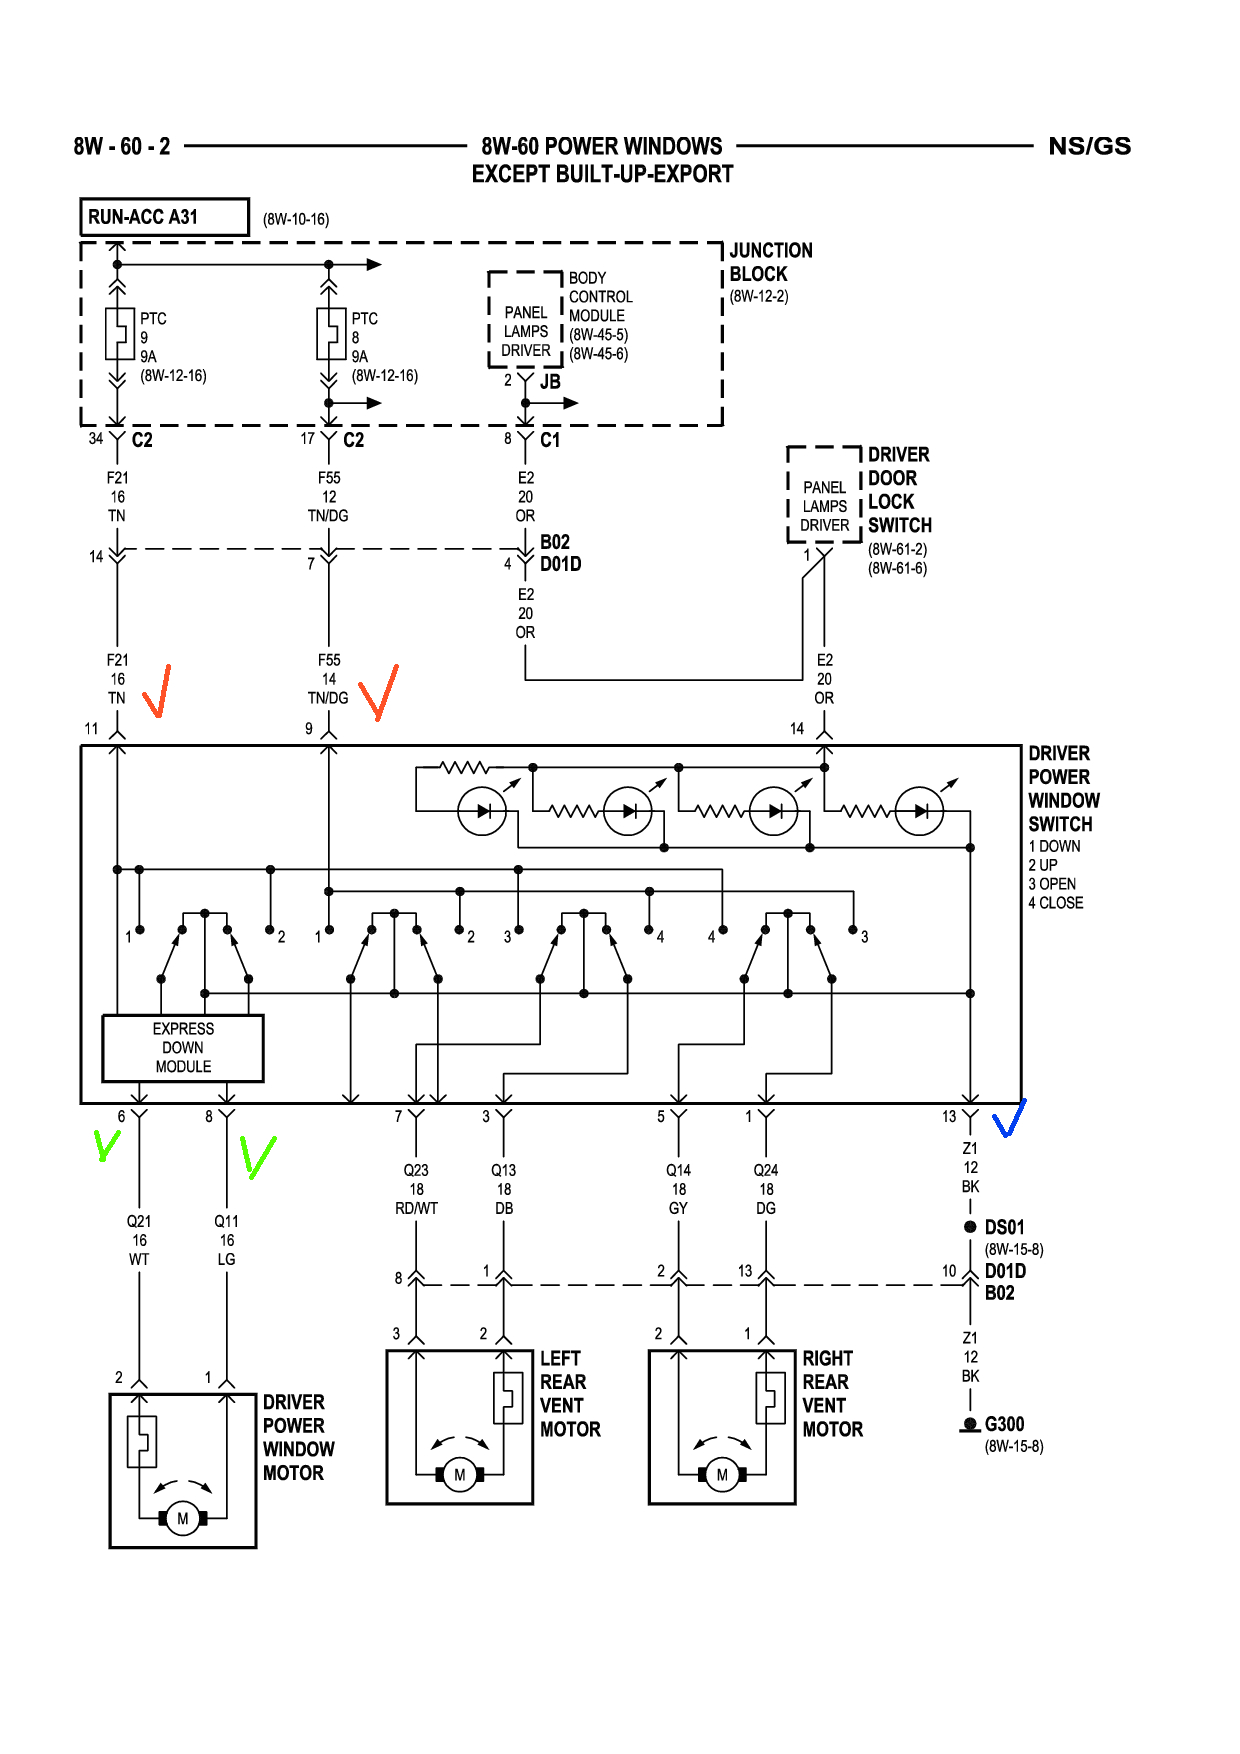 2001 Dodge Caravan Wiring Diagram Wiring Diagram Dodge Caravan 2007 Wiring Diagram today